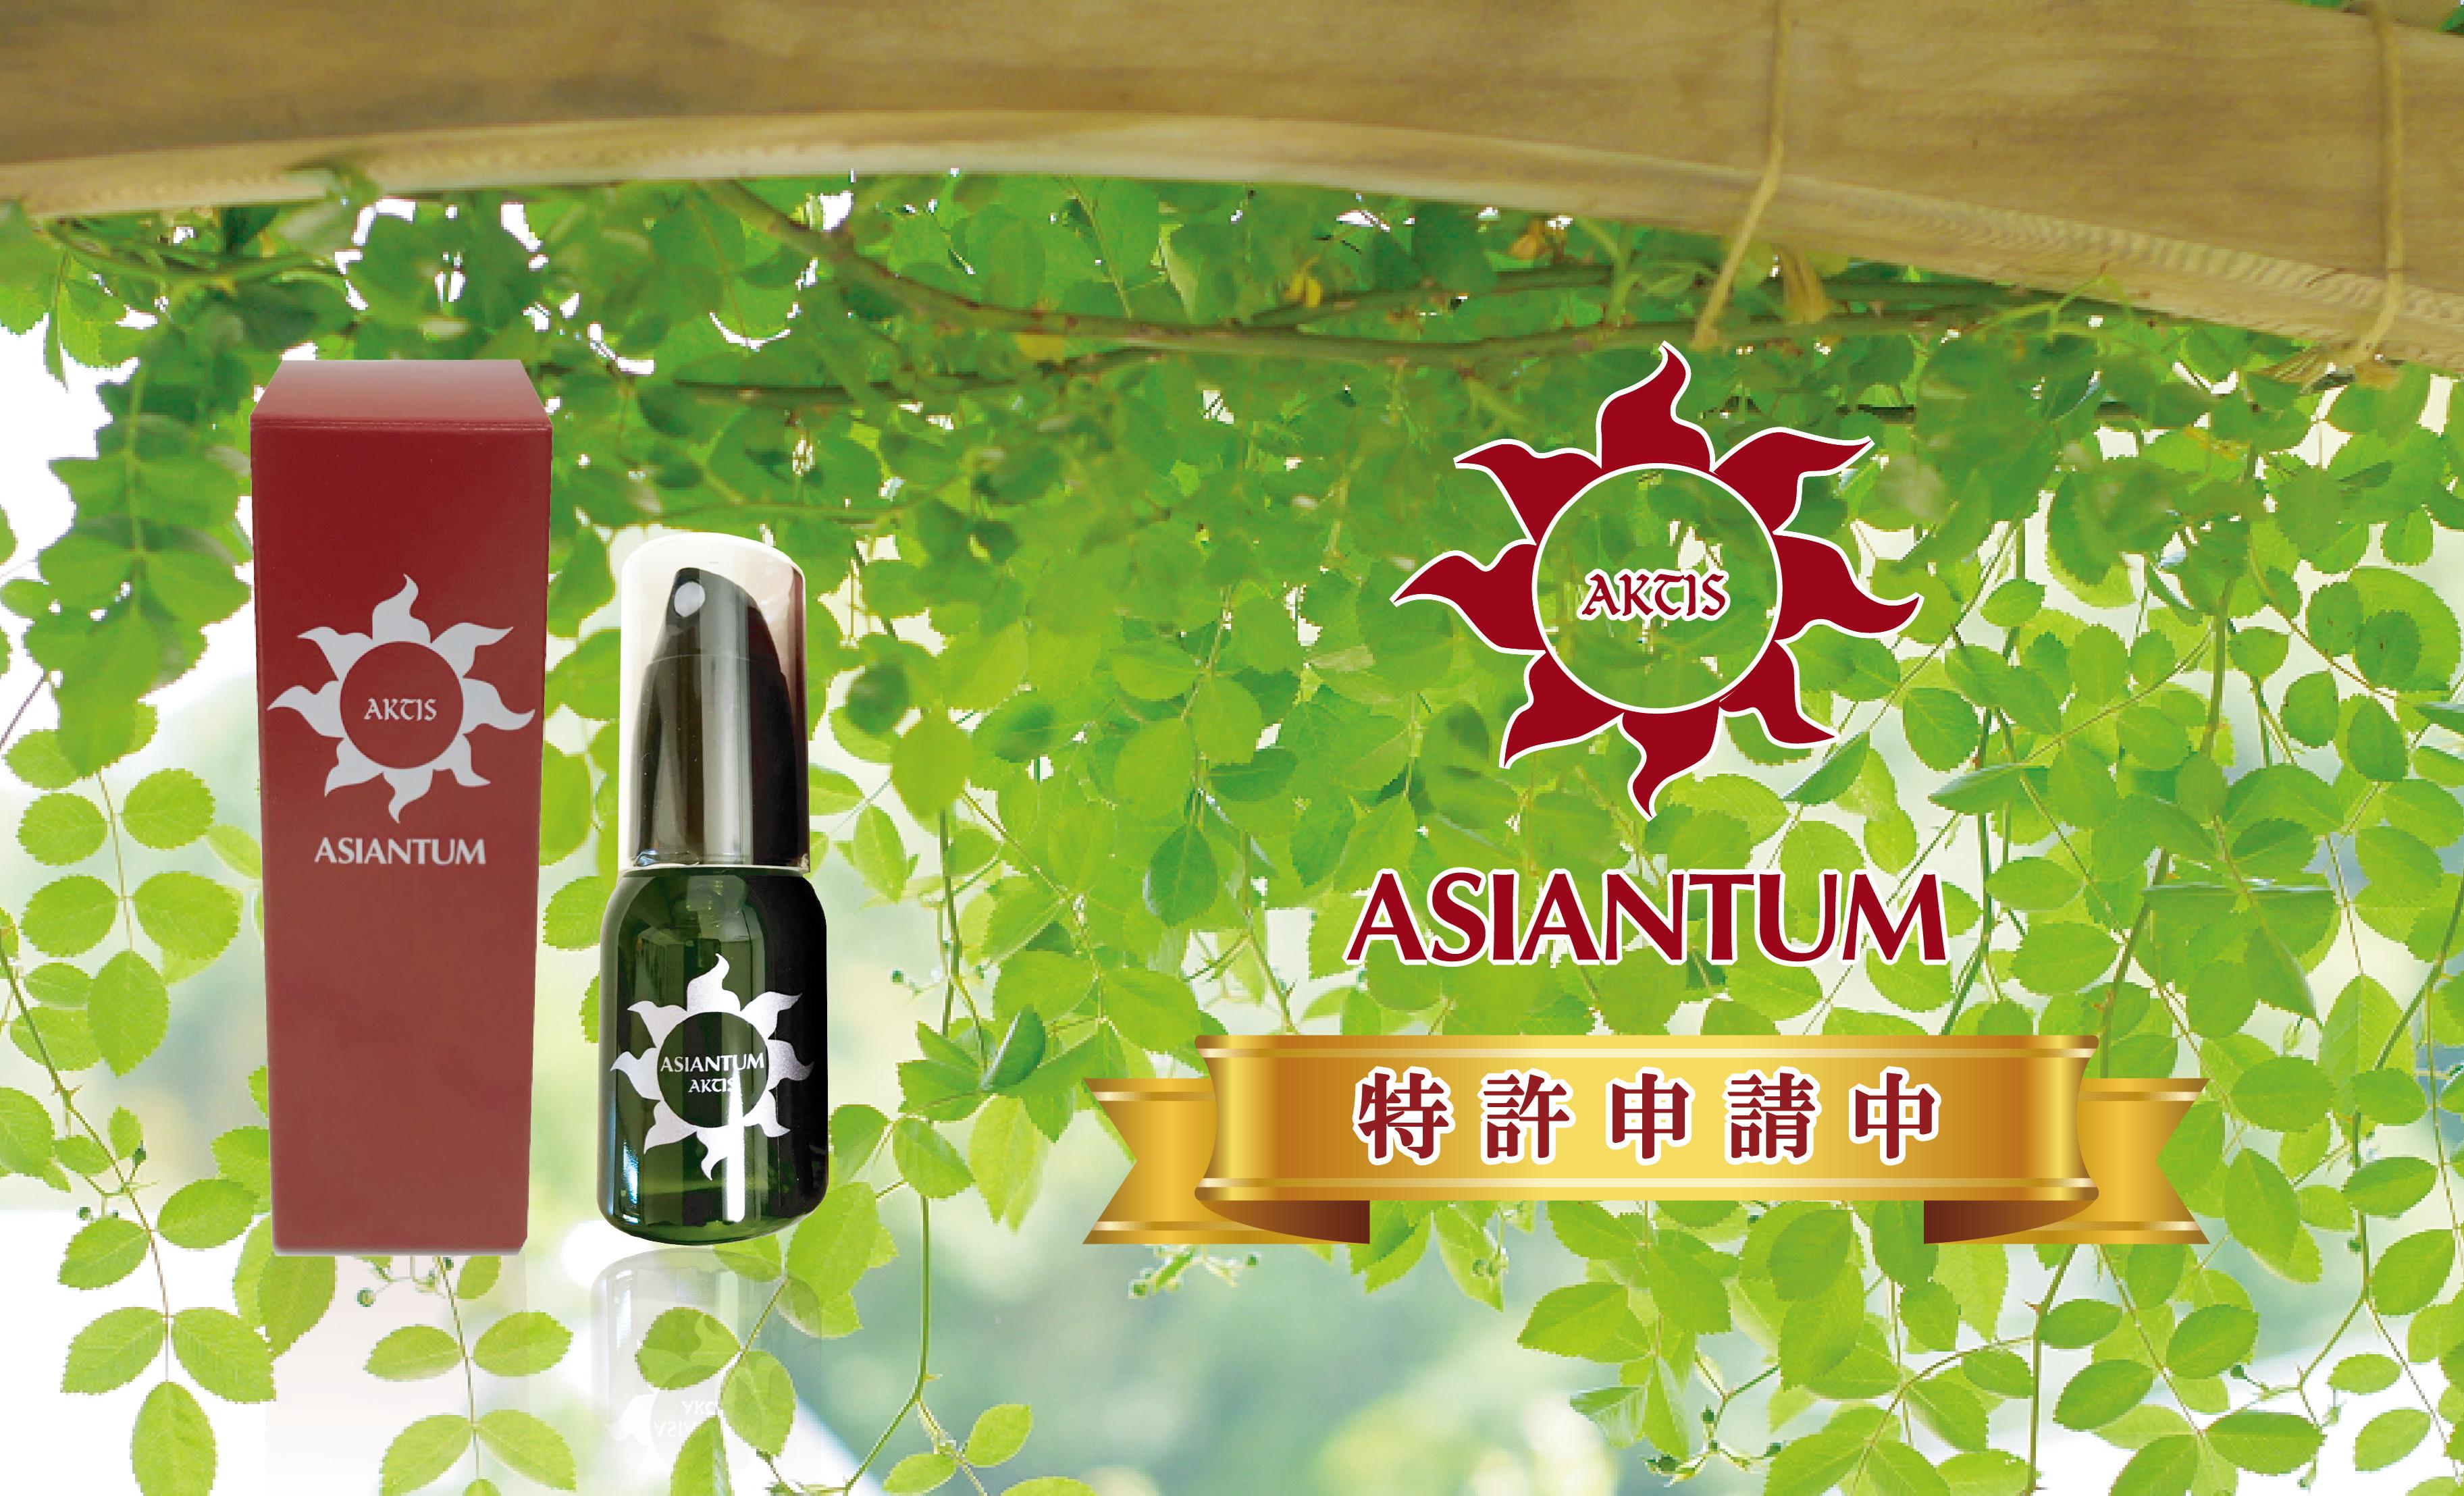 ASIANTUM(アジアンタム)特許出願中(シン・セシア)